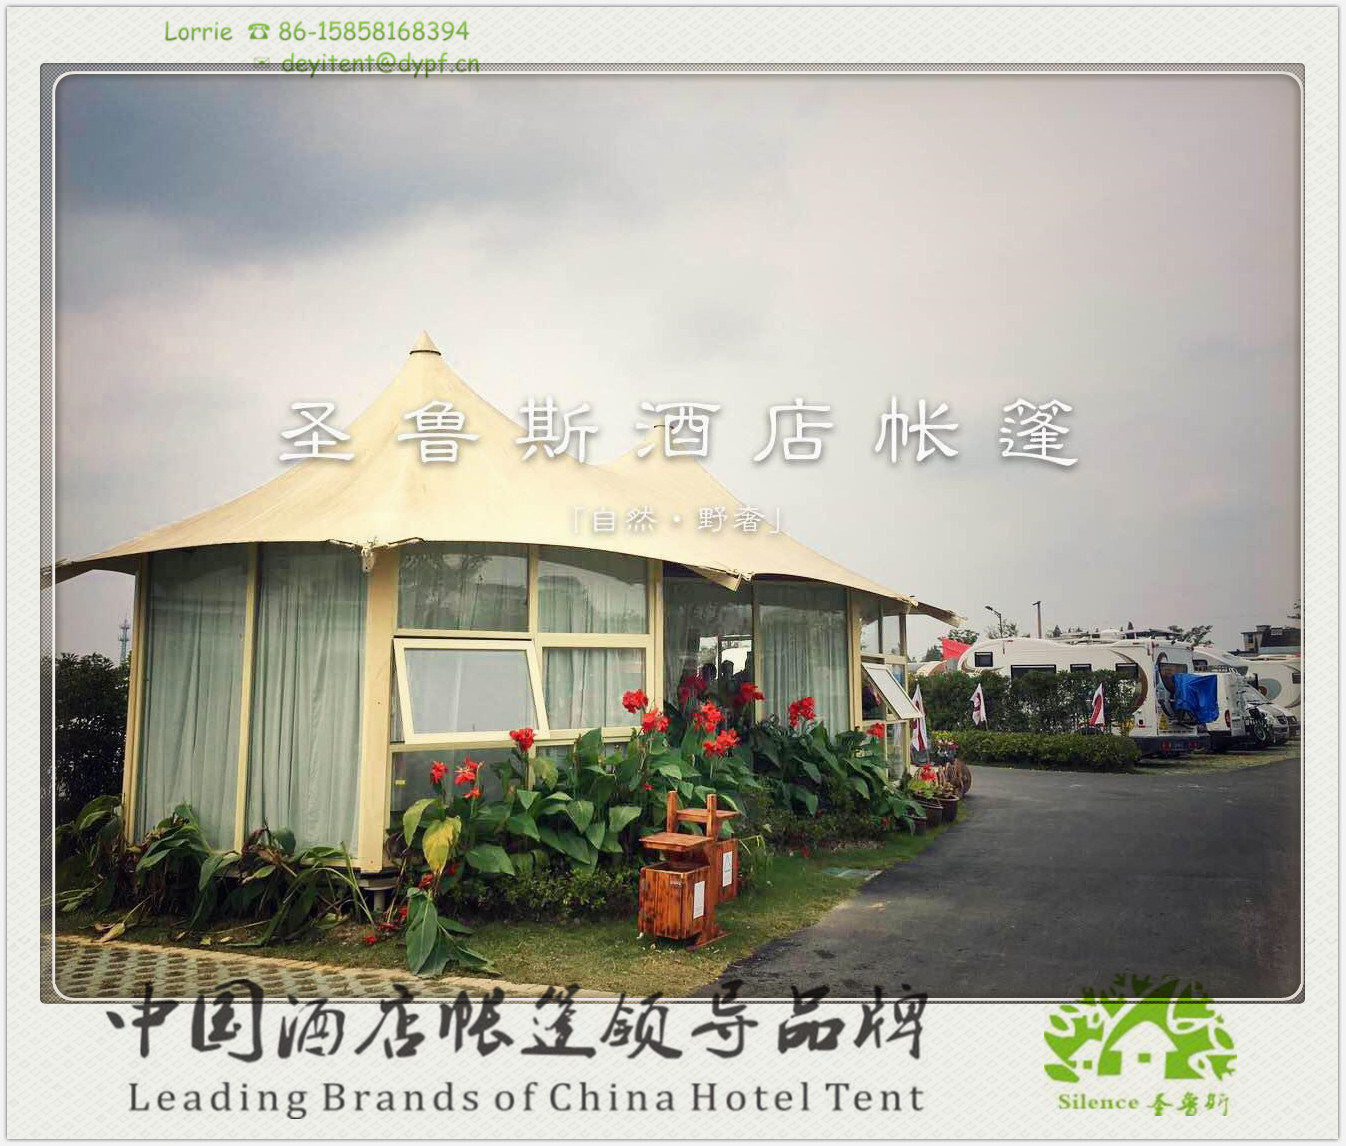 China Octagon Luxury Resort Tent / Hotel Tent - China Luxury Hotel Tent Luxury Octagon Tent & China Octagon Luxury Resort Tent / Hotel Tent - China Luxury Hotel ...